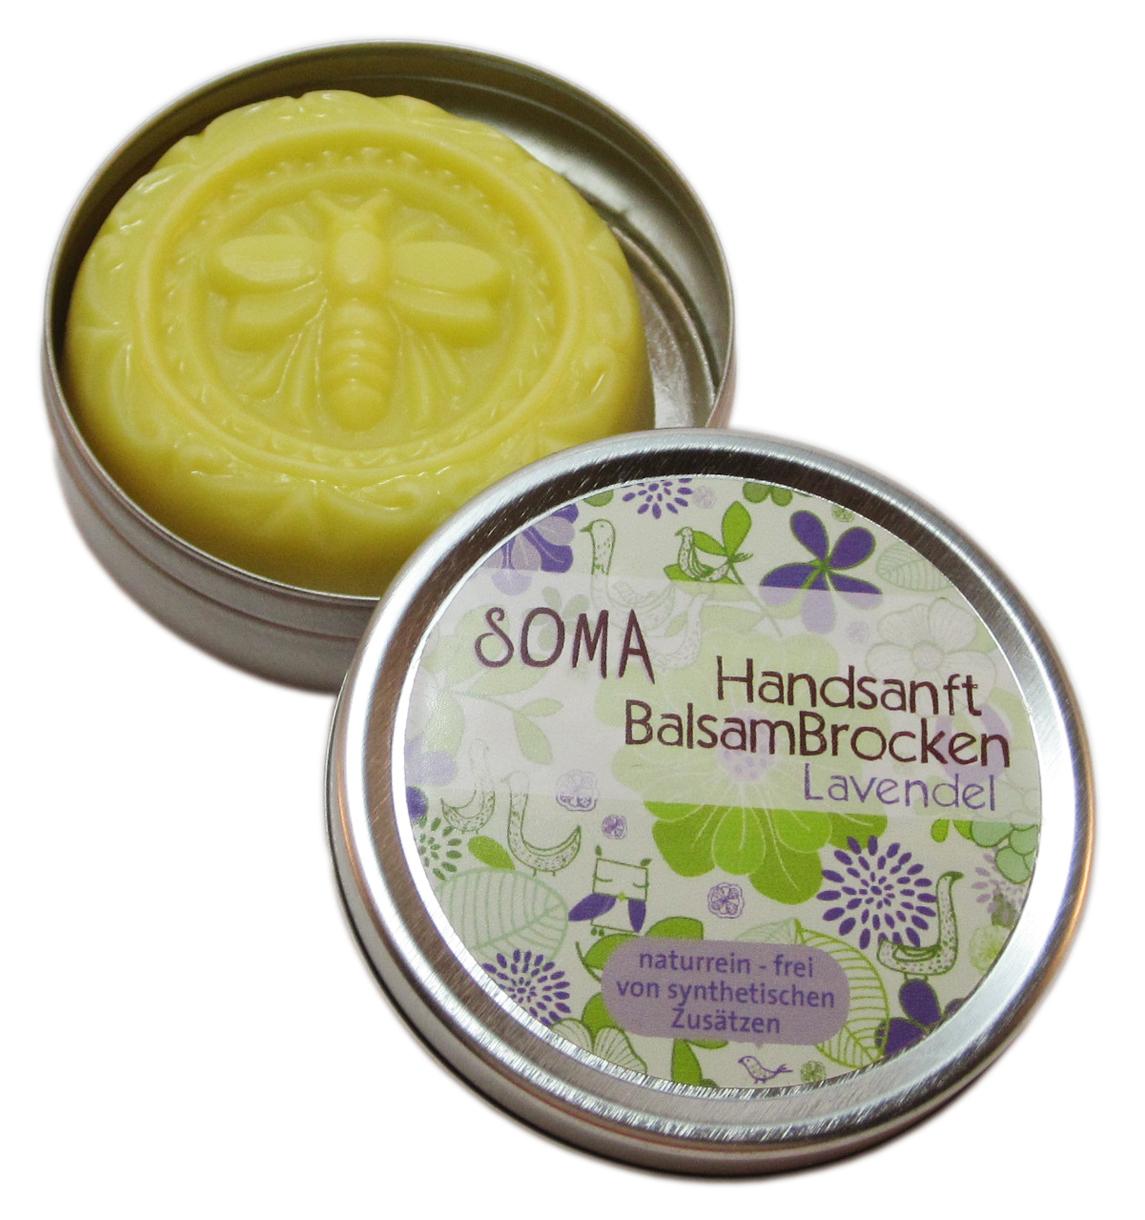 HandSanft Balsam Brocken